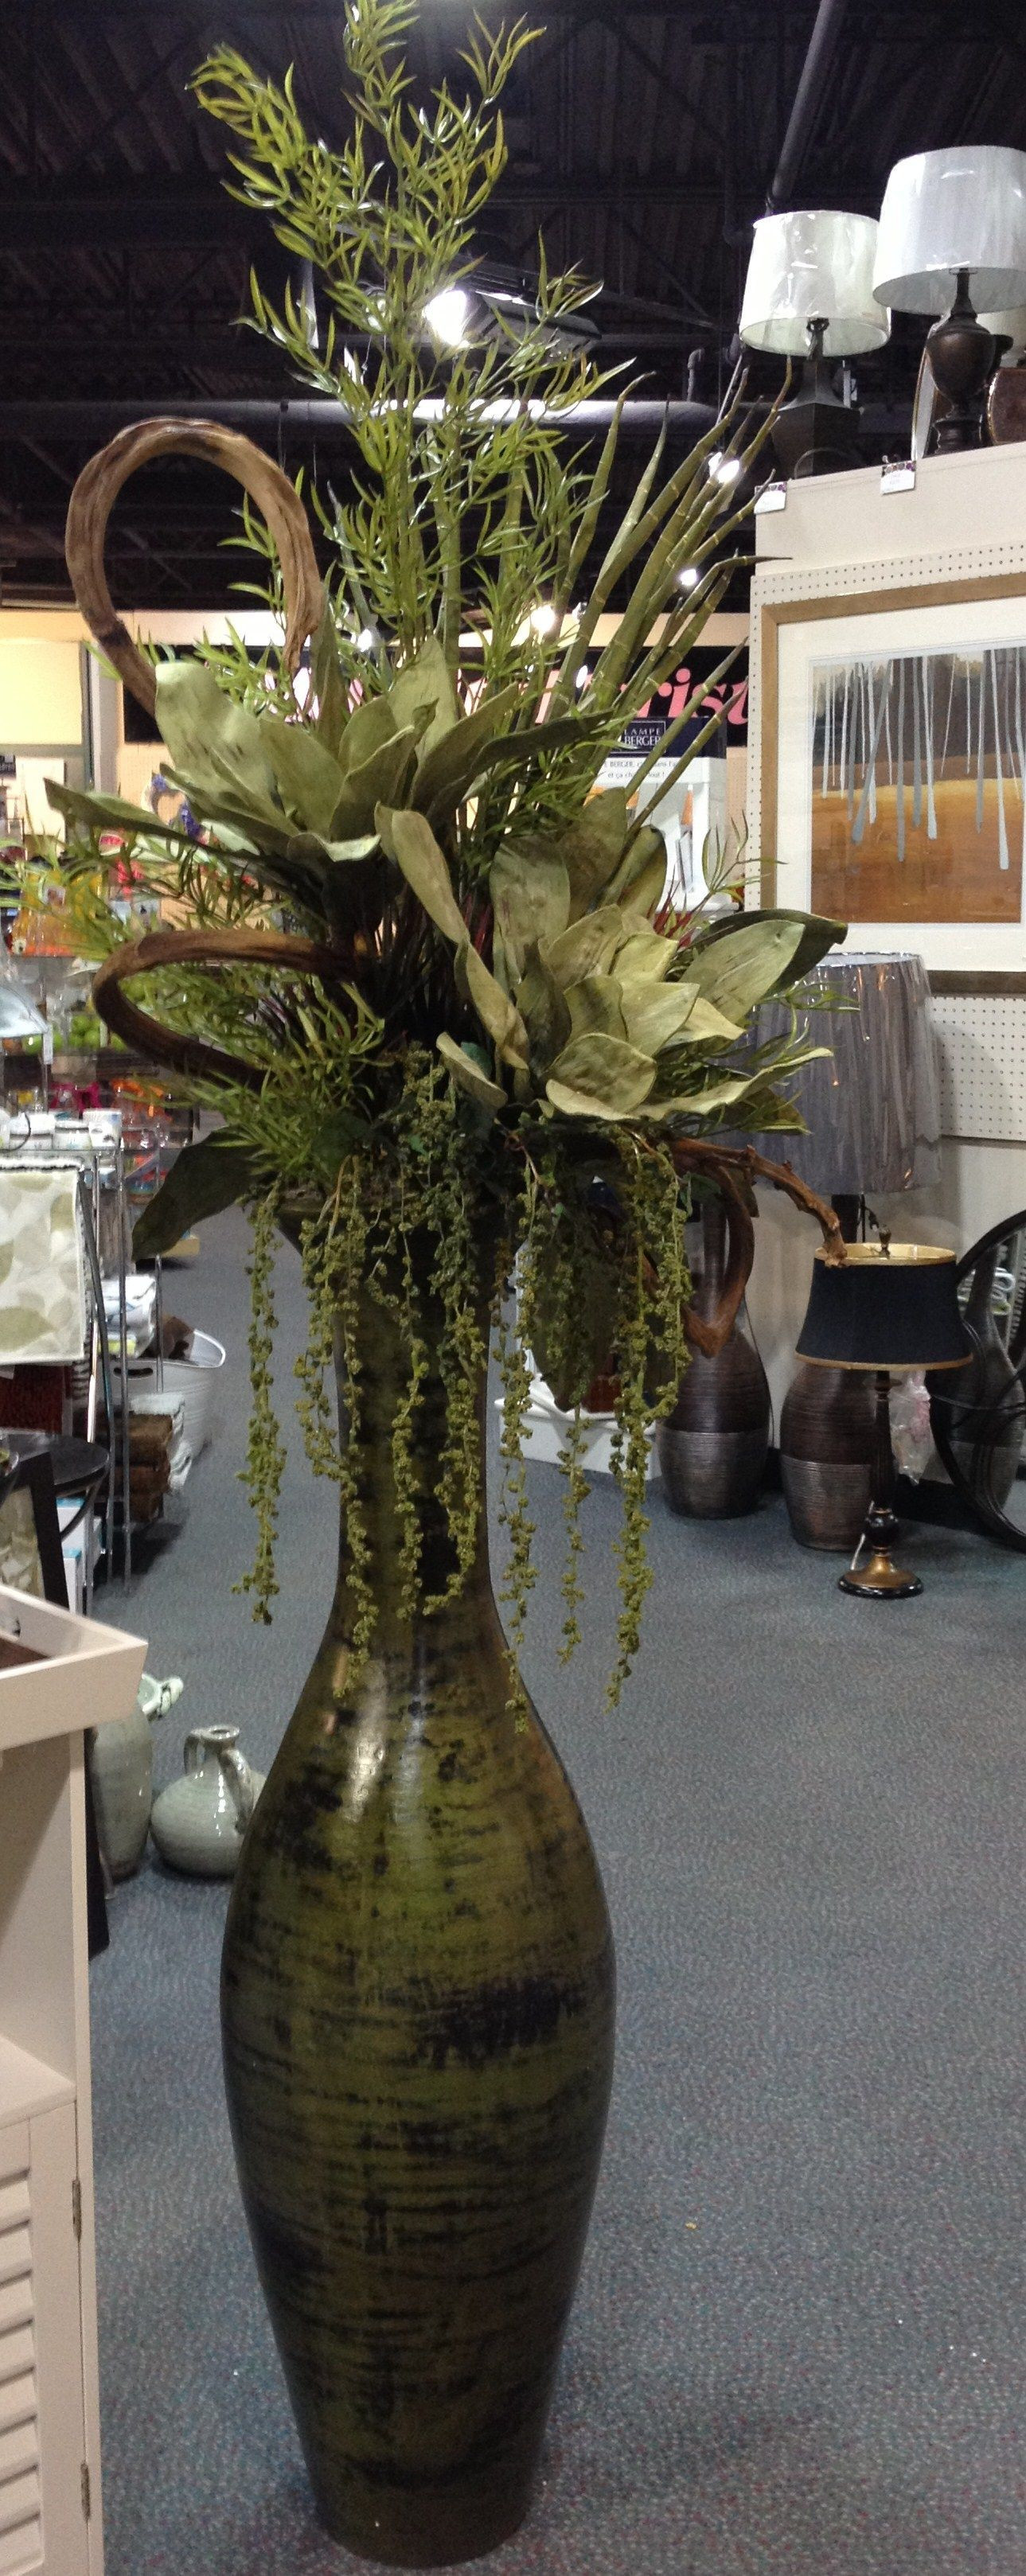 26 attractive Long Floor Vases Online India 2021 free download long floor vases online india of 32 wide mouth vase the weekly world in large floor vase arrangement designed by sandra macpherson